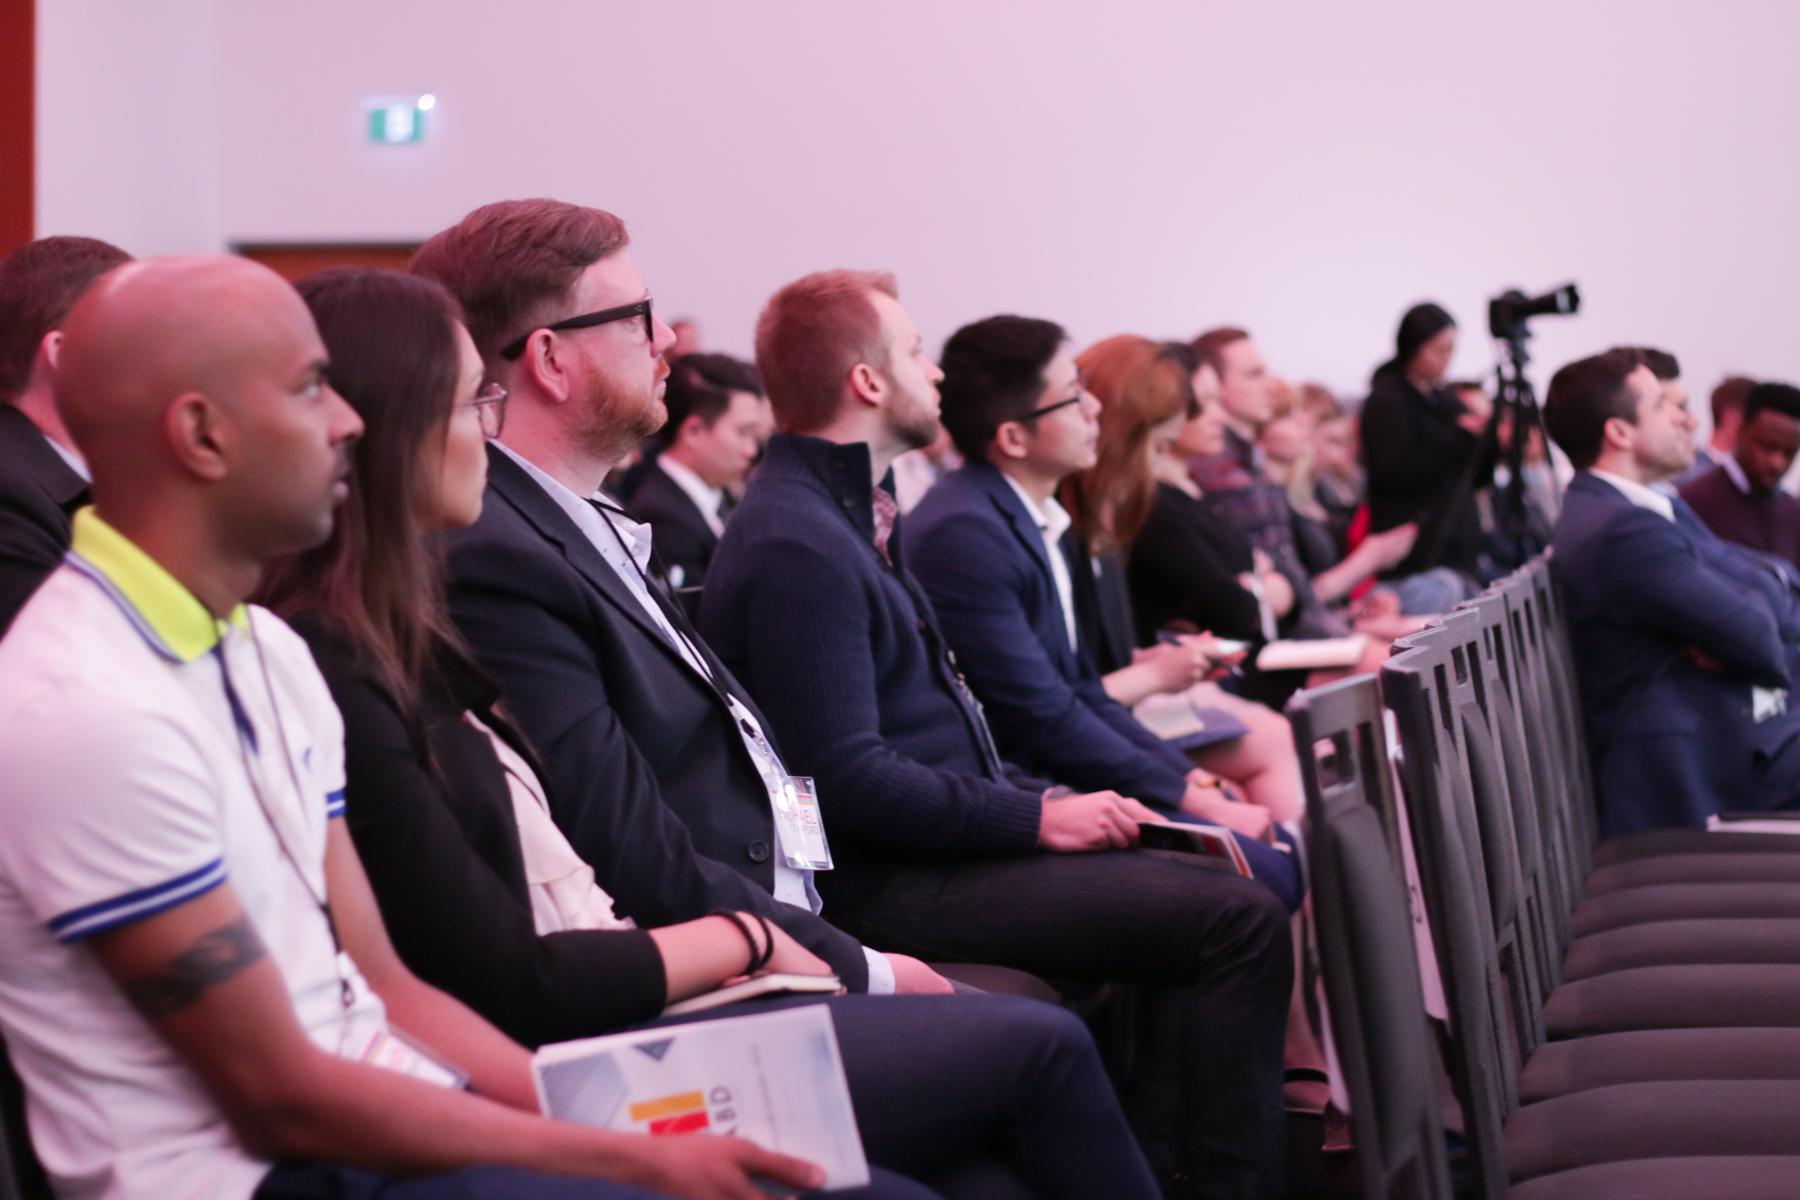 ABD_Conference_2018-021.jpg